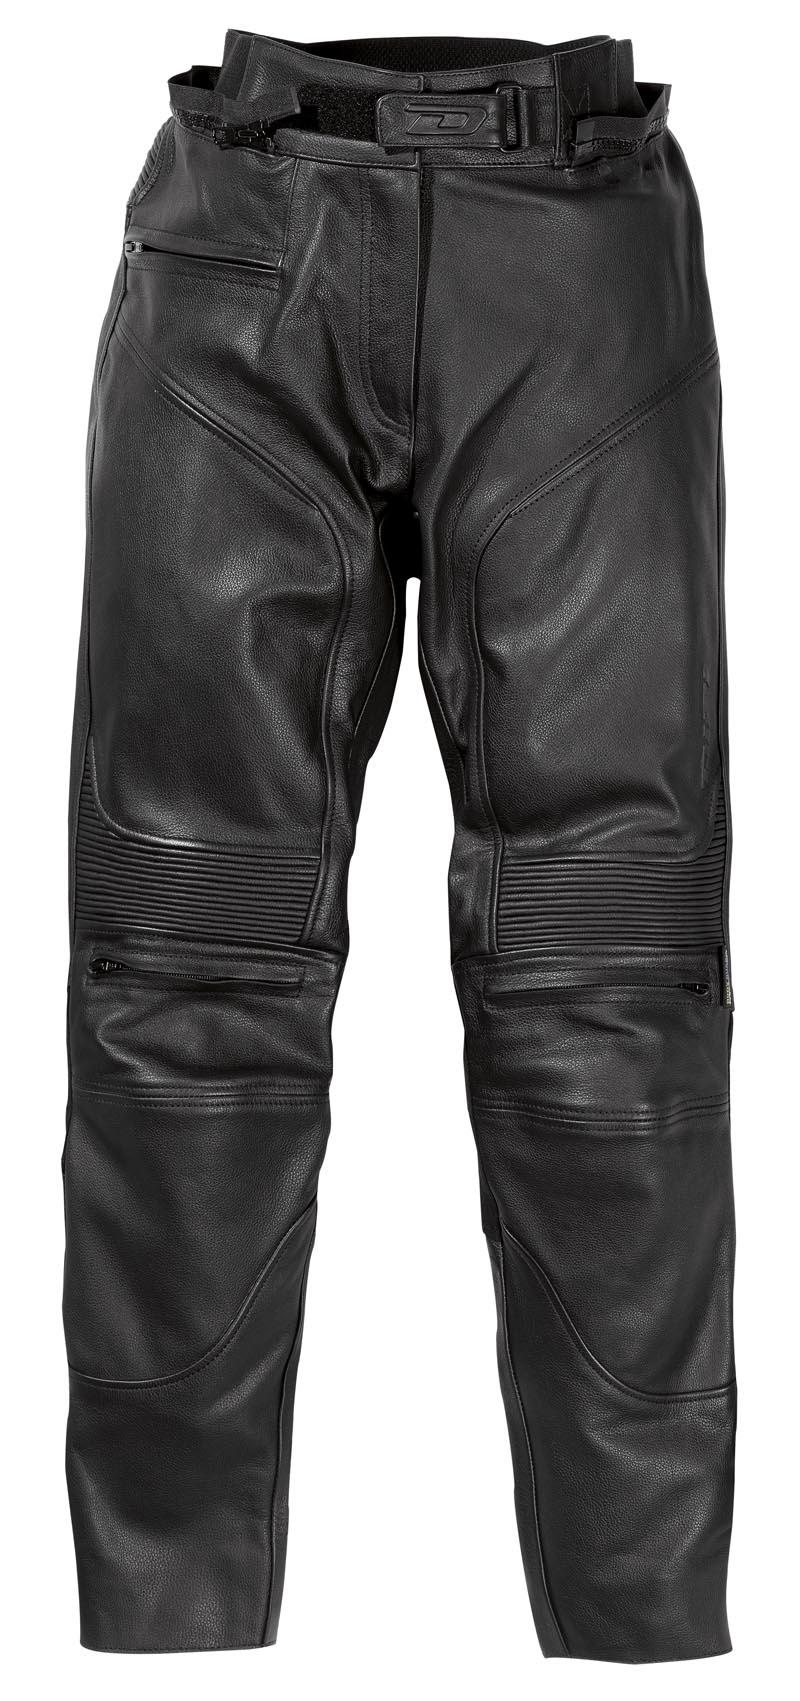 Pantalon femme BIANCA - DIFI noir